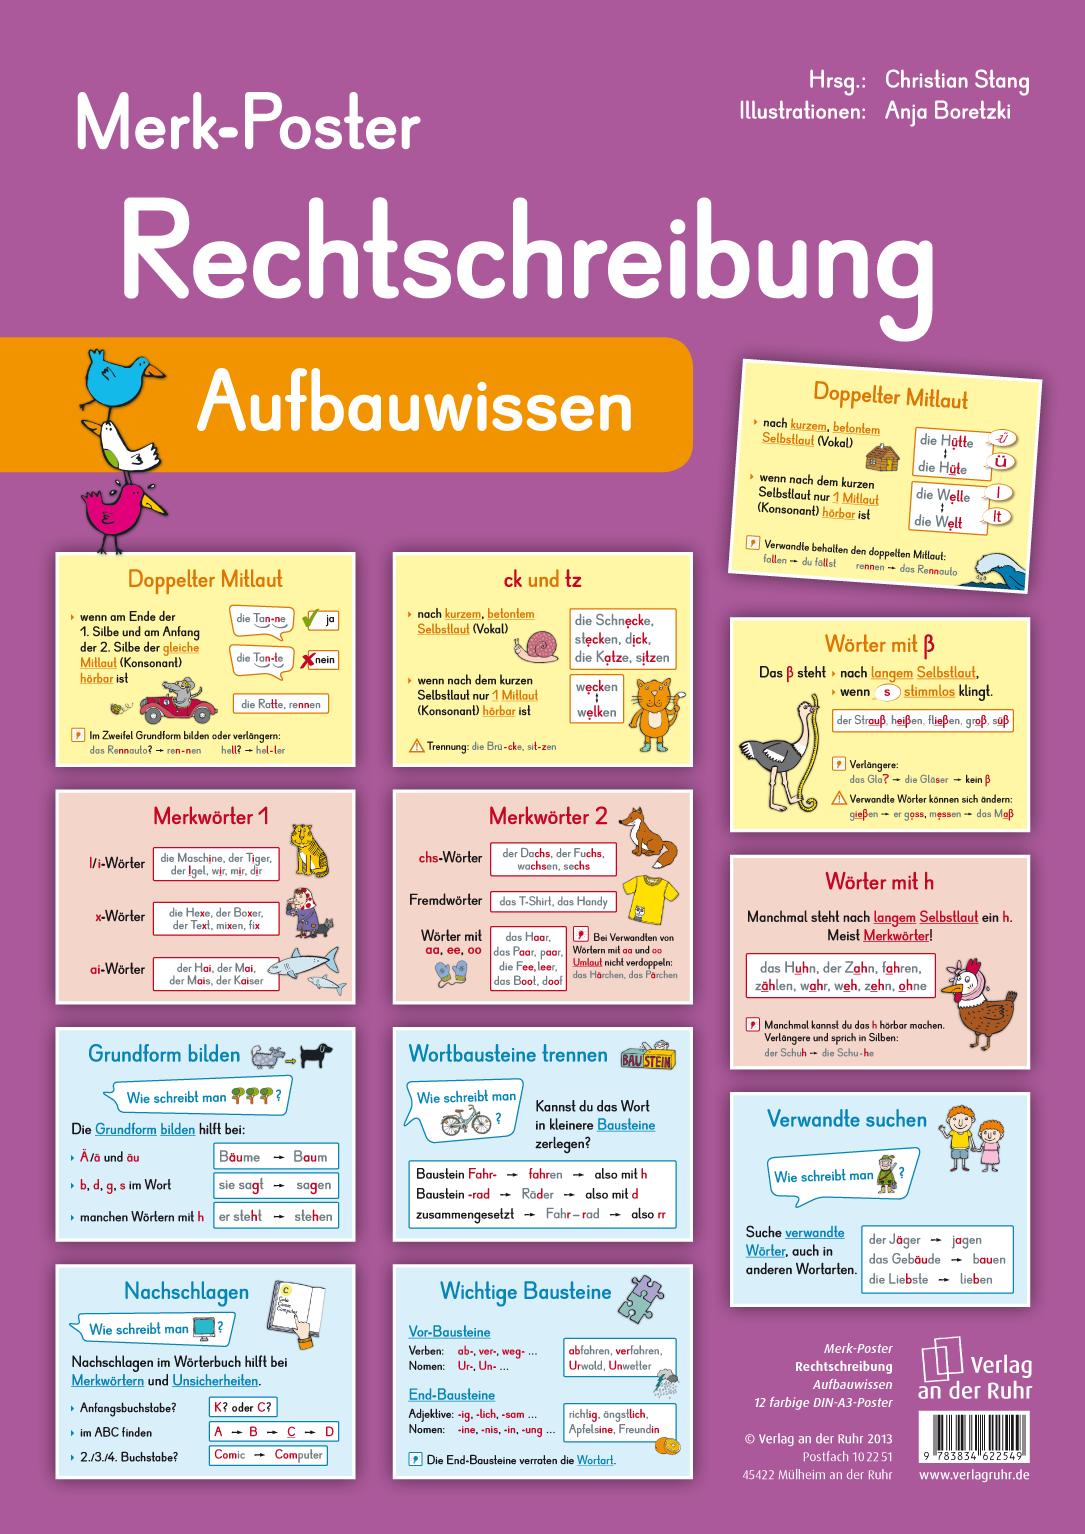 Rechtschreibung - Aufbauwissen | Pinterest | Rechtschreibung, Schule ...